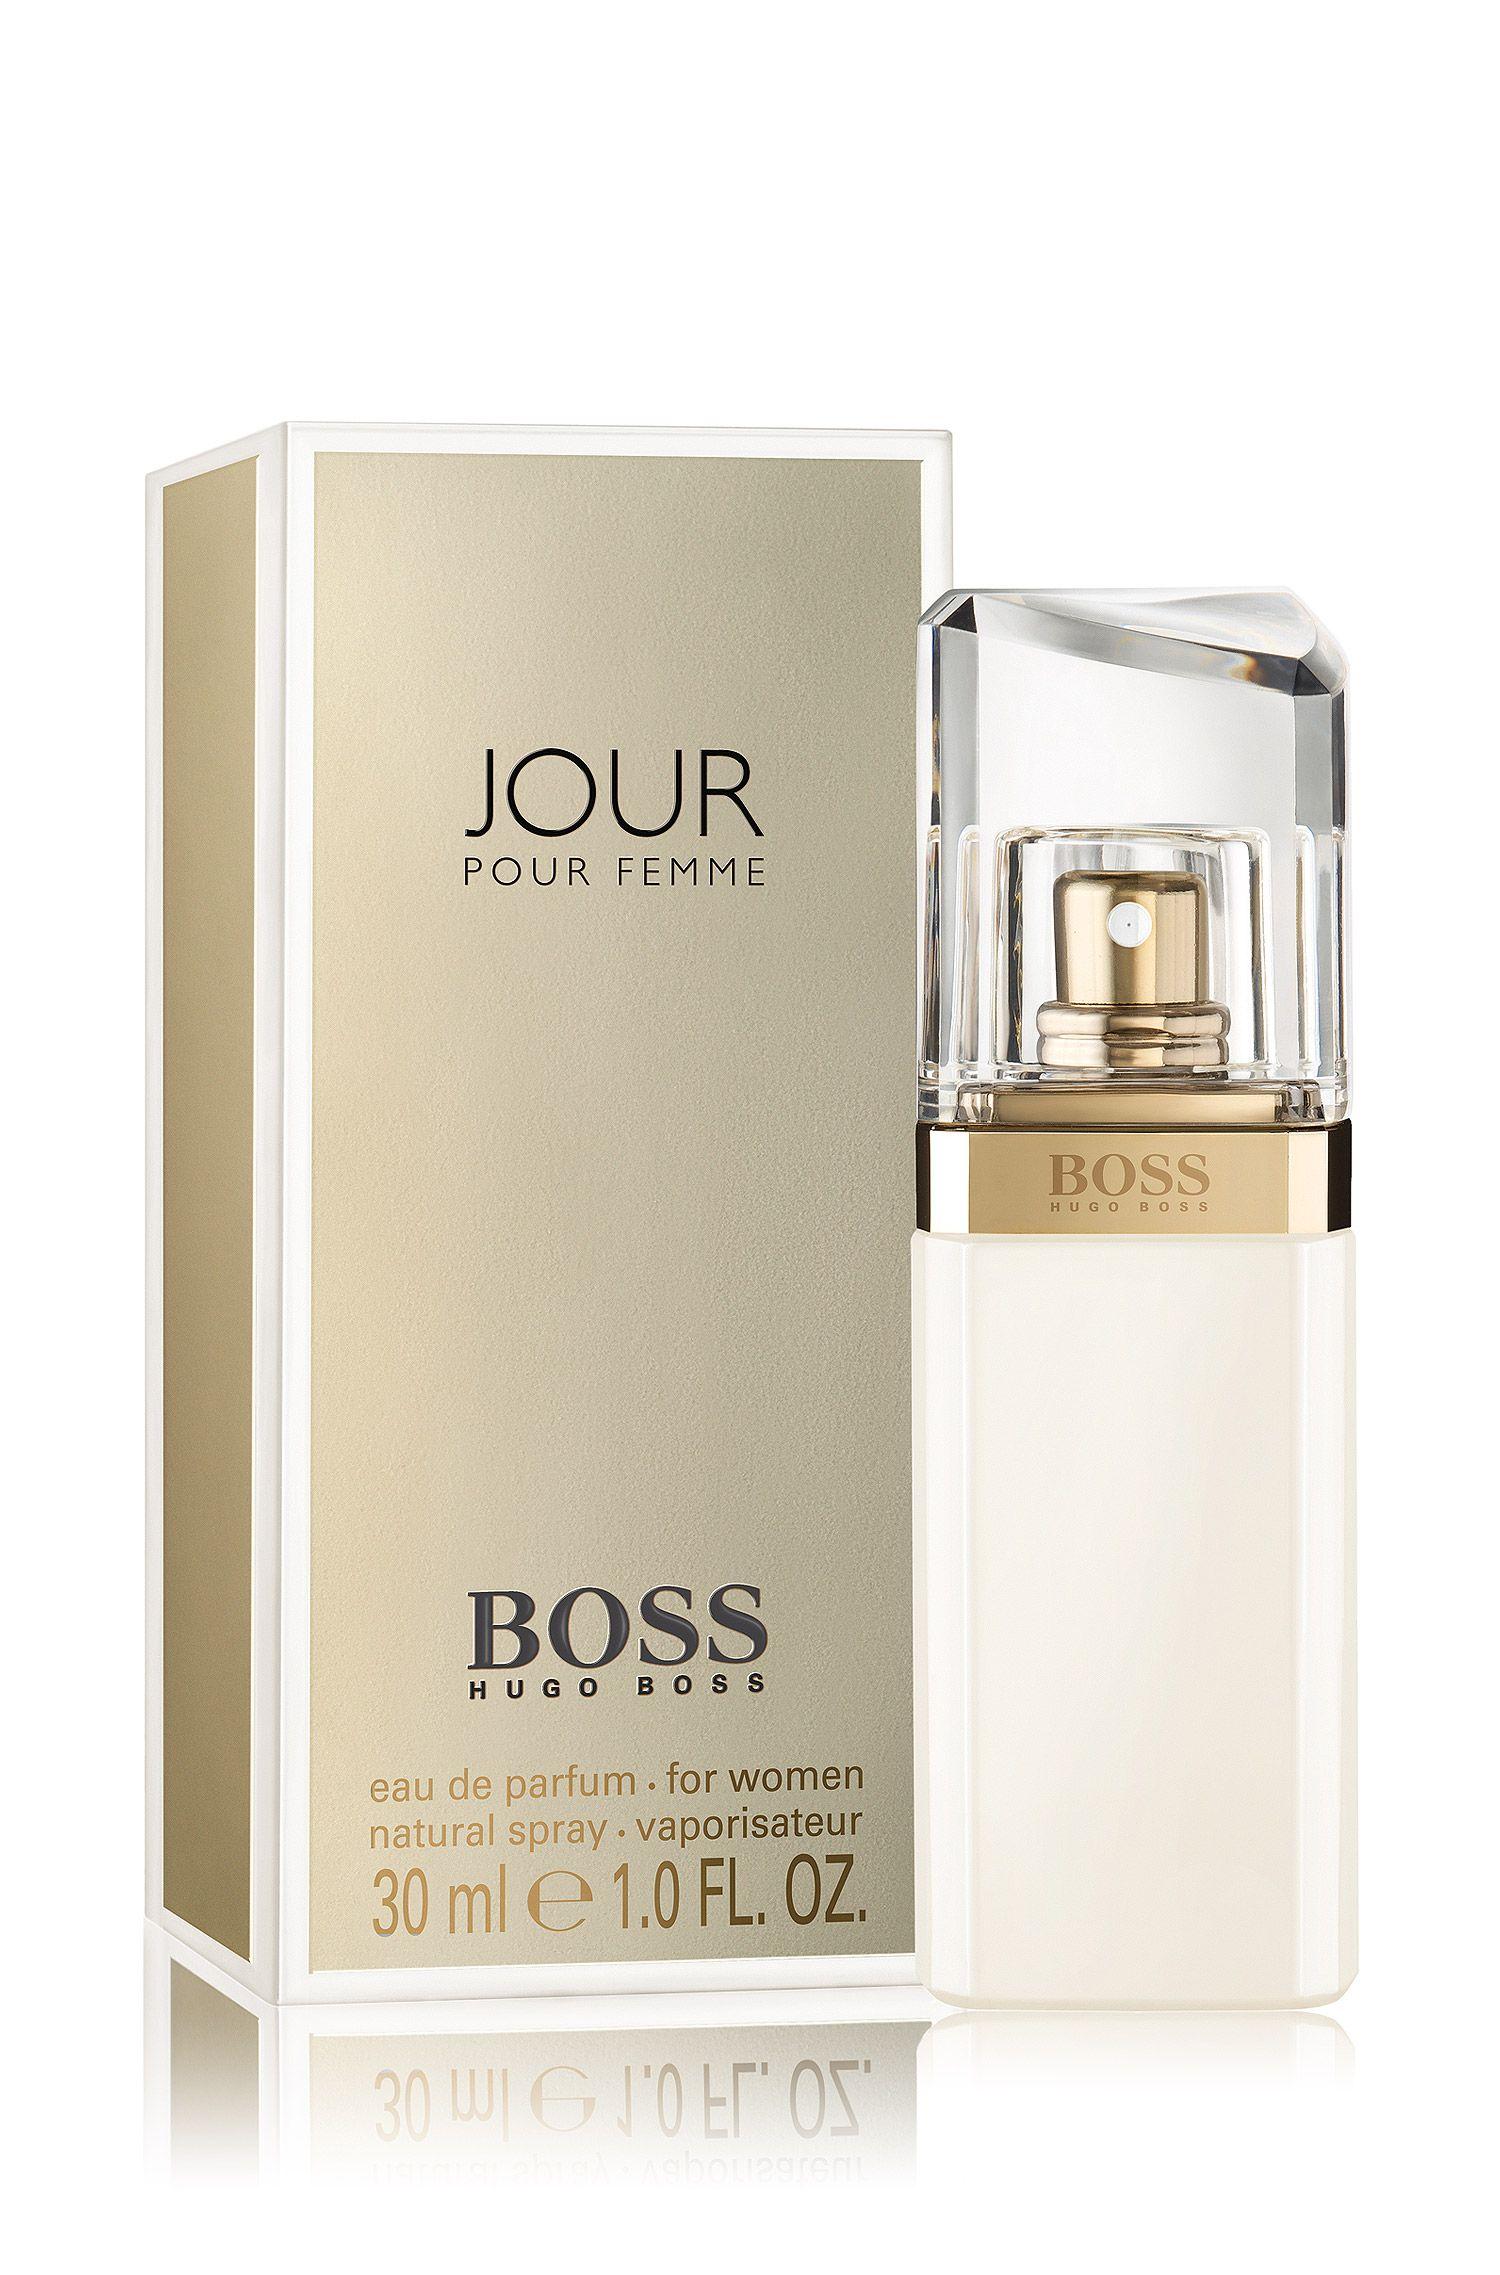 BOSS Jour eau de parfum 30 ml